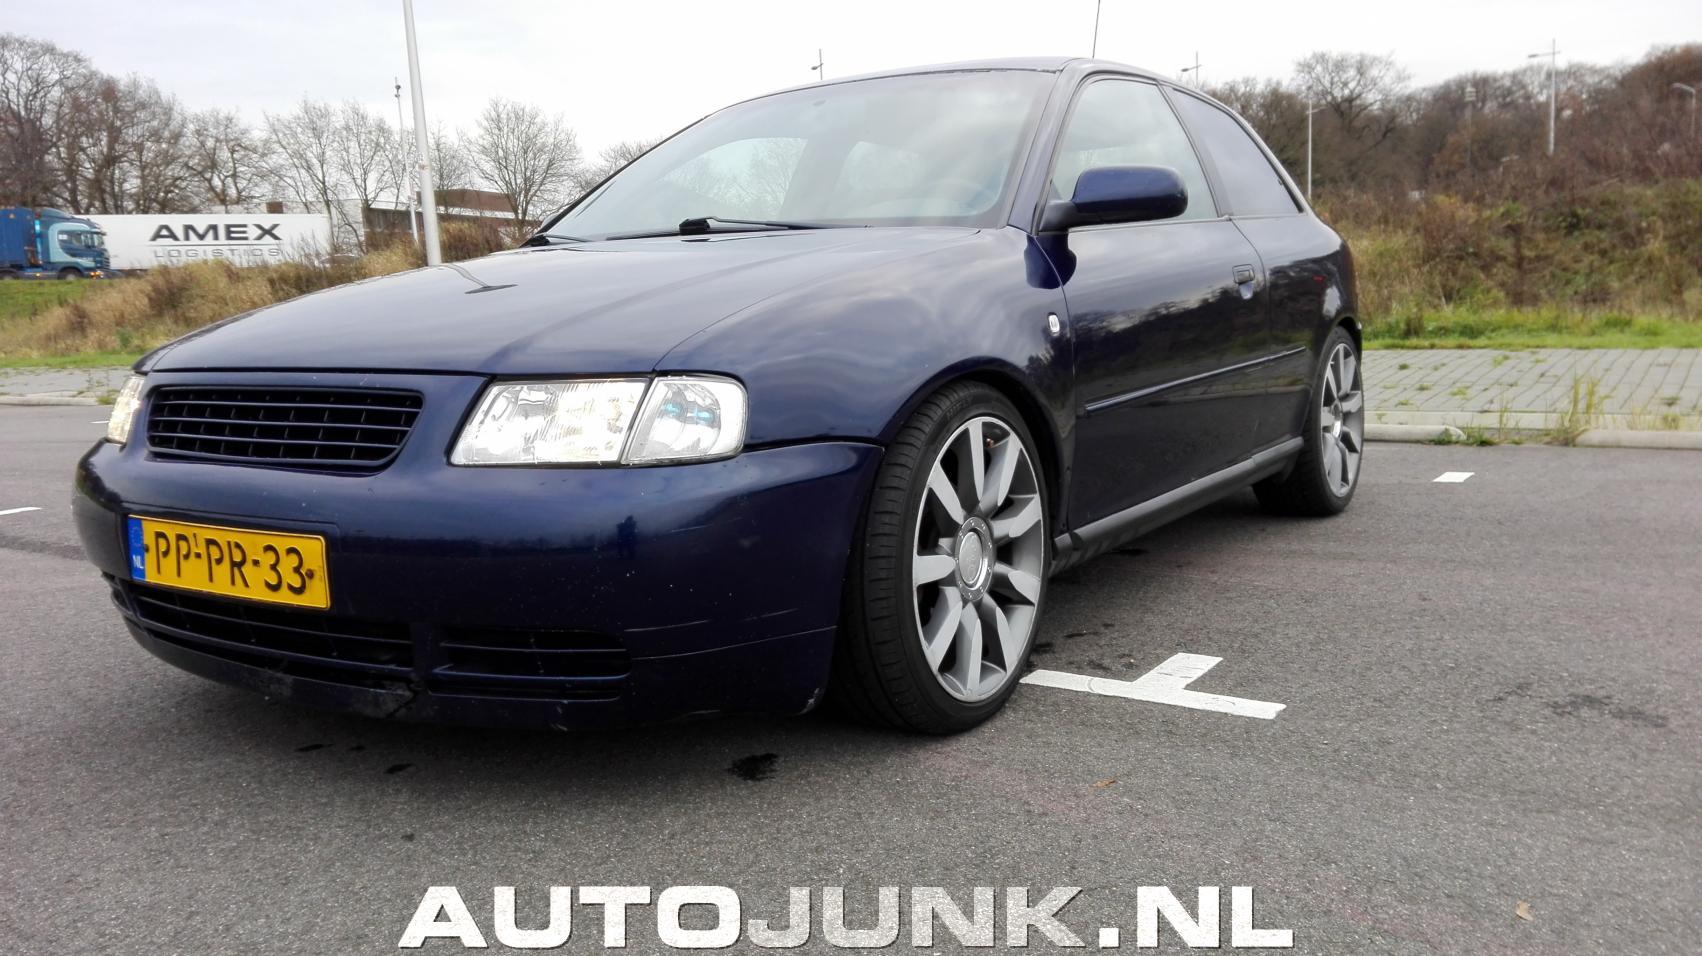 Audi A3 1996 foto's » Autojunk.nl (161003)